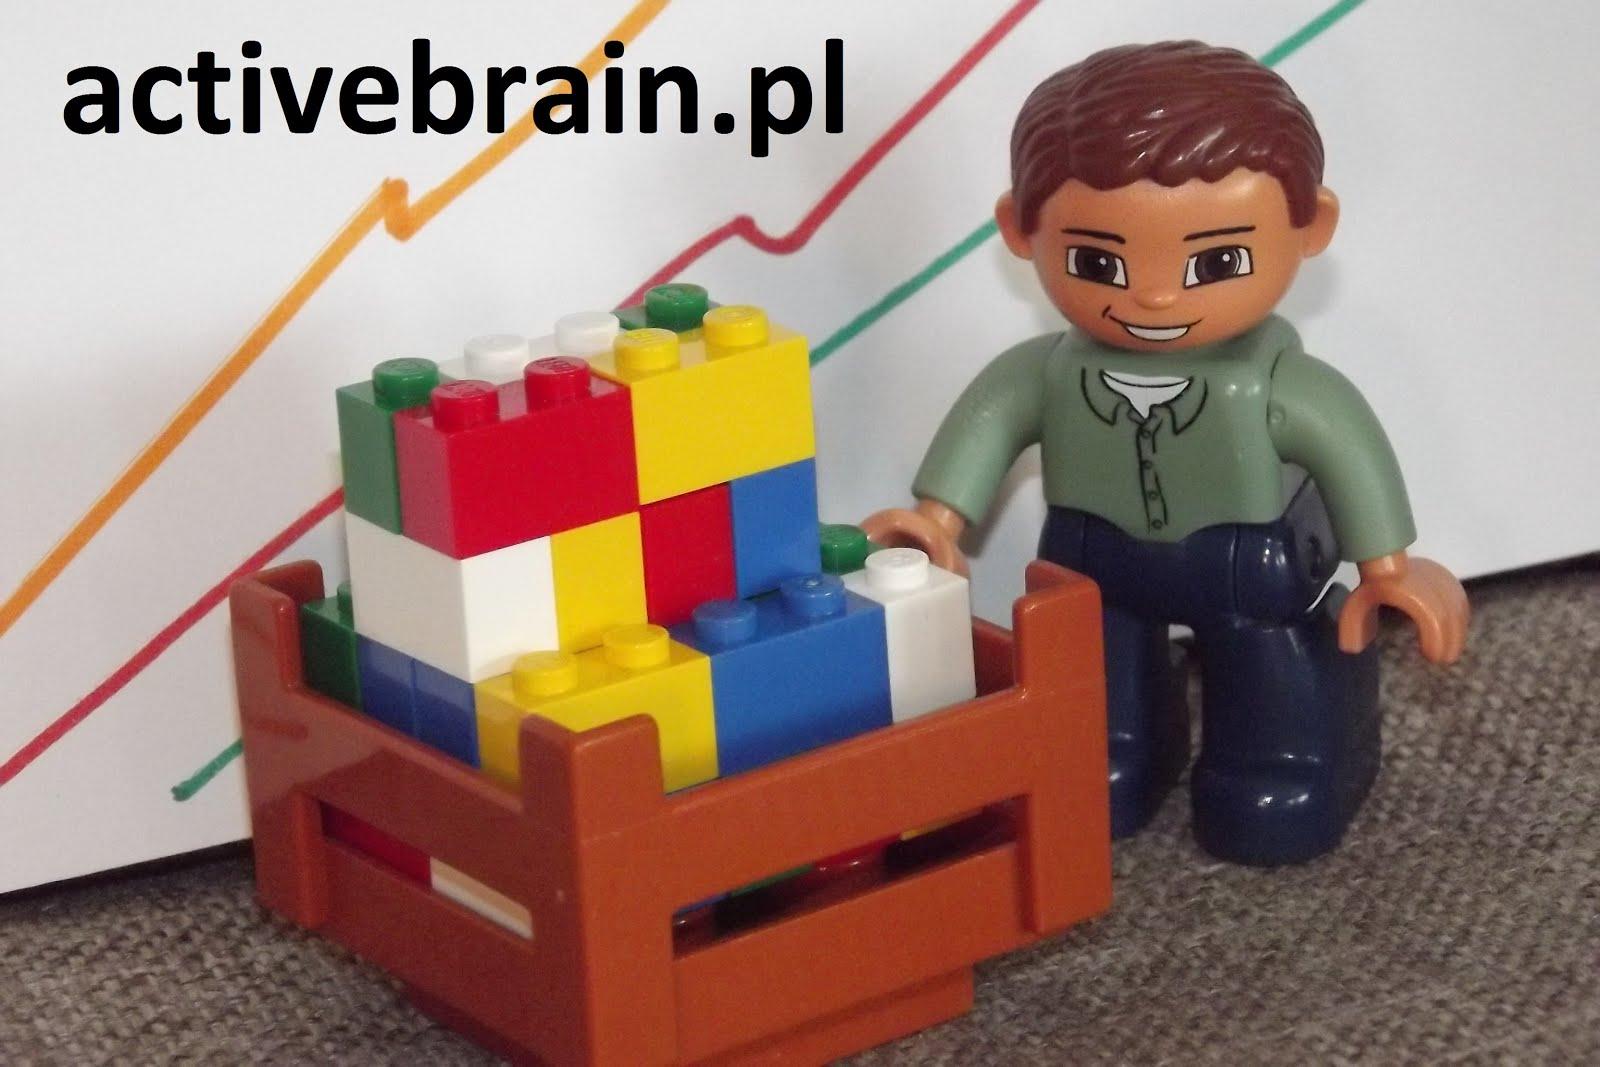 activebrain.pl